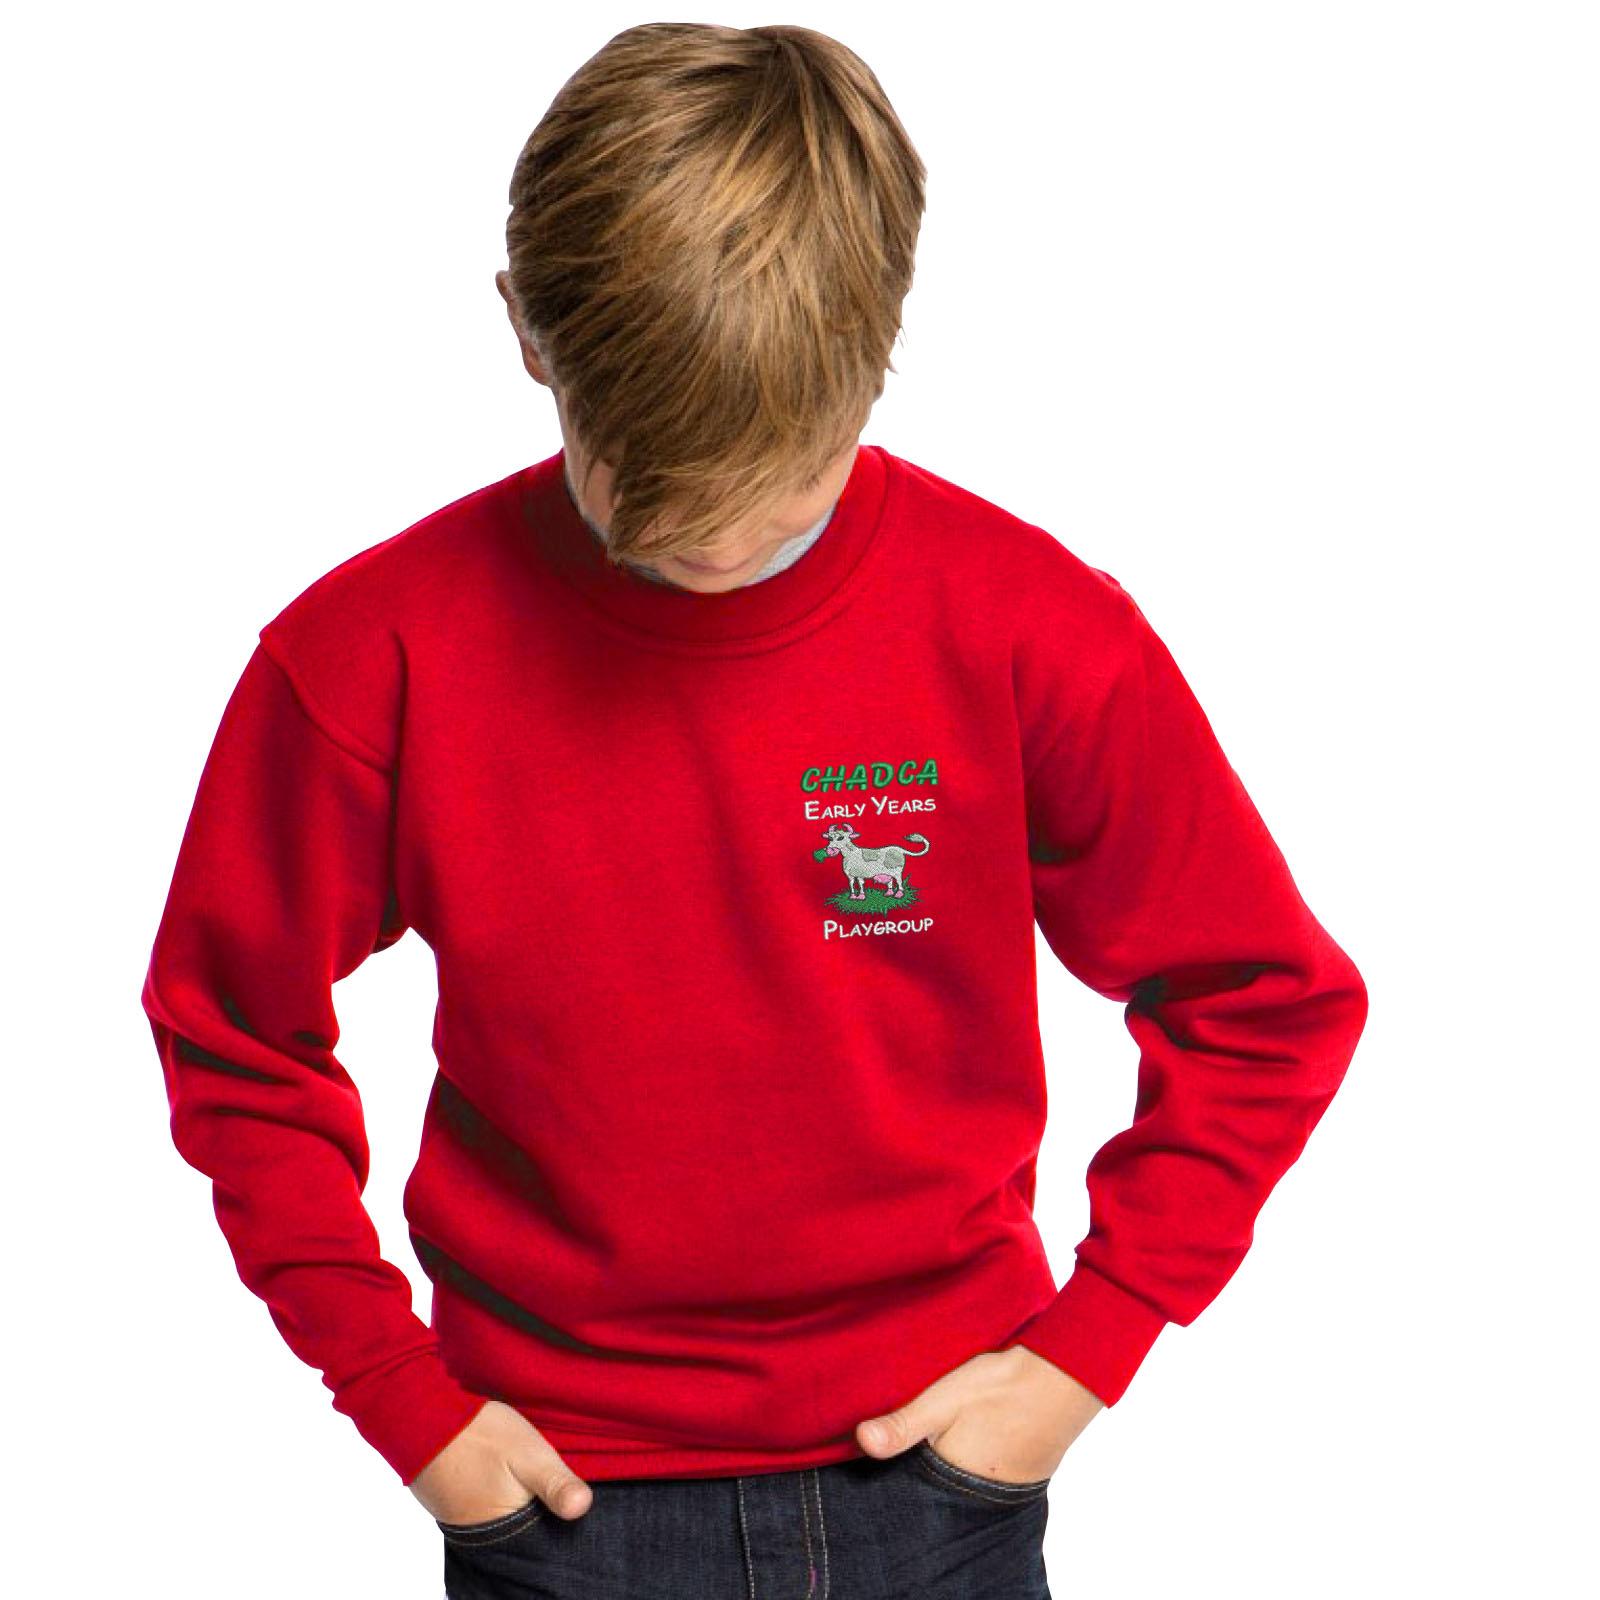 Chadca Sweatshirt